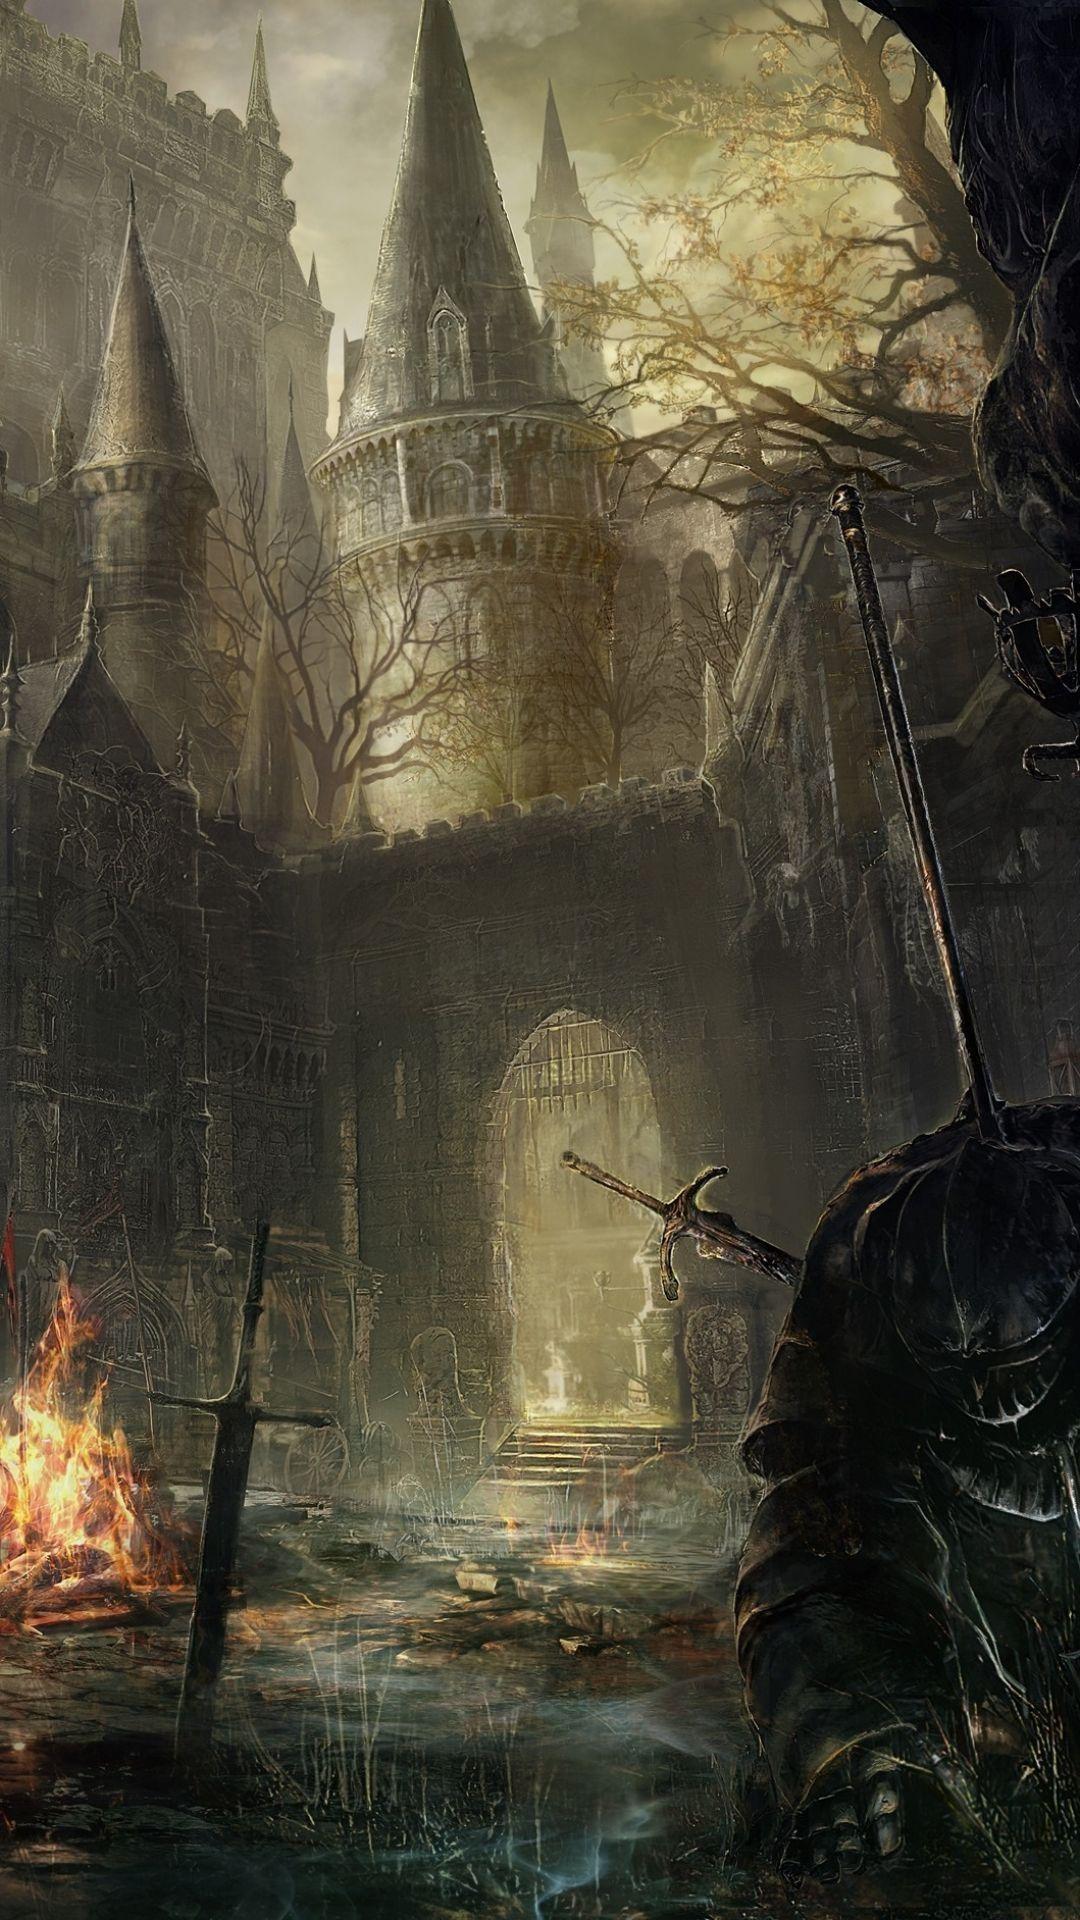 iPhone 7 Plus – Video Game/Dark Souls III – Wallpaper ID: 607891